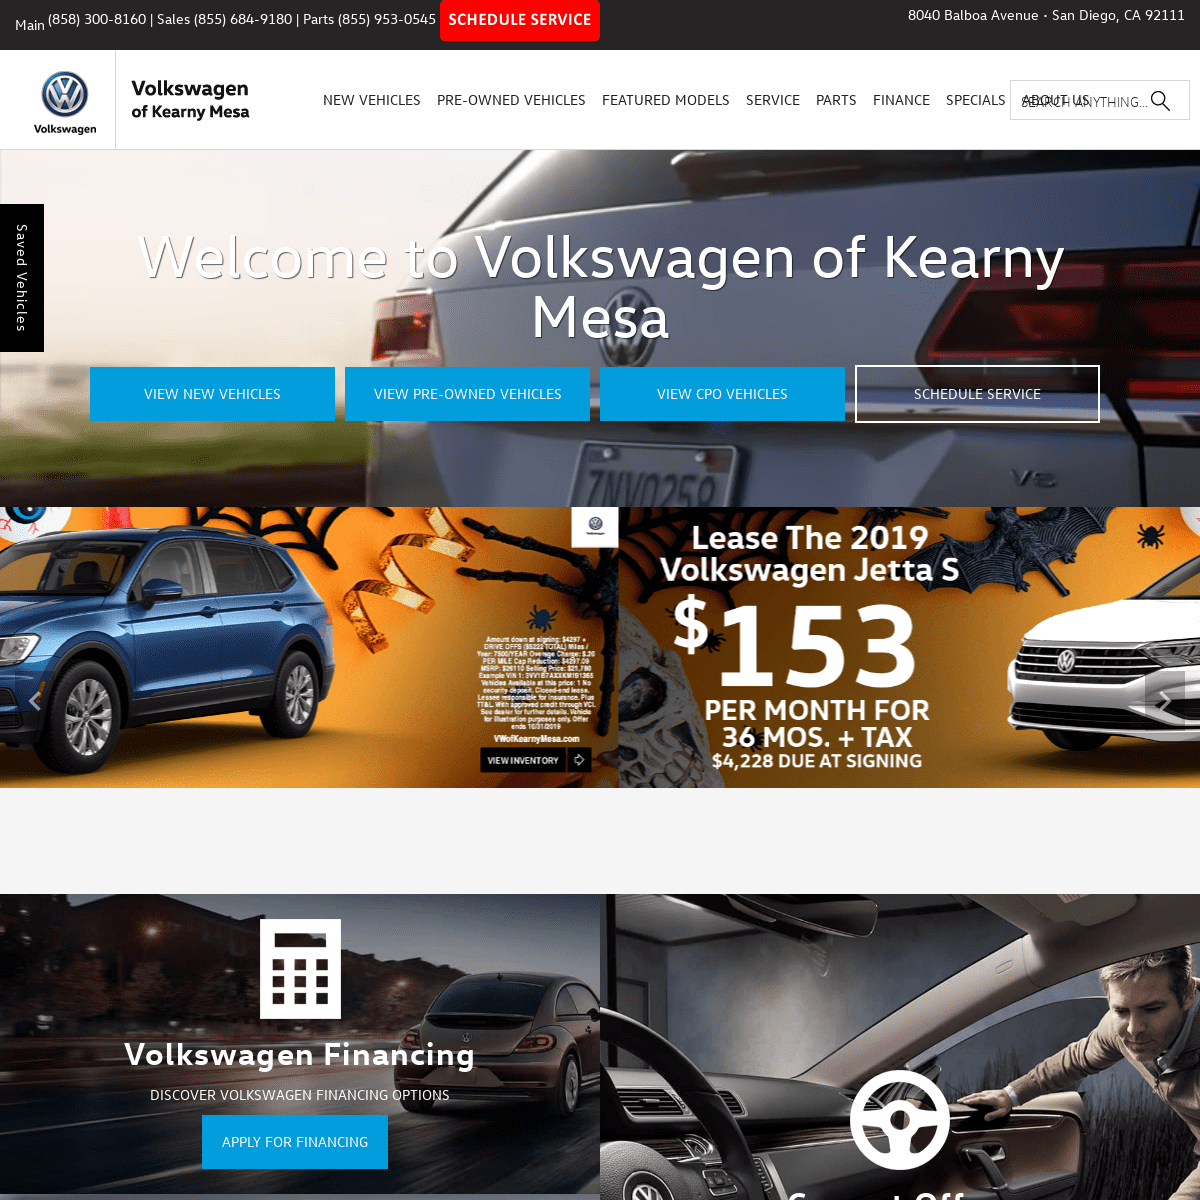 volkswagen of kearny mesa car dealership serving san diego vwofkearnymesa com citation archivebay com archivebay com